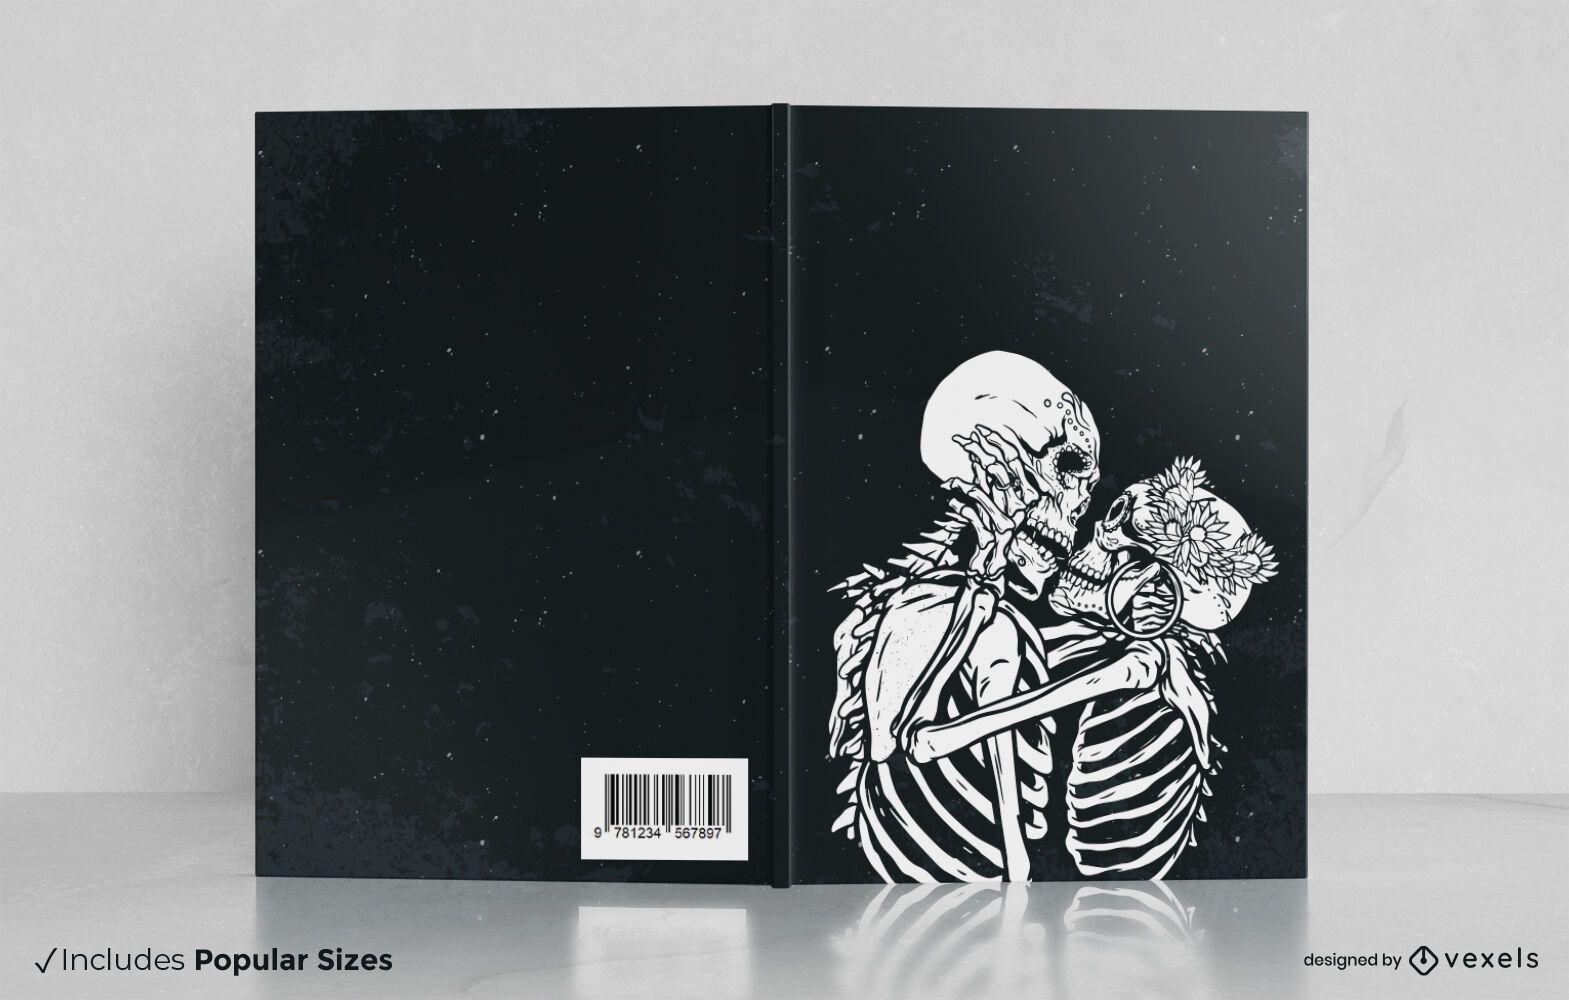 Skeleton kiss book cover design